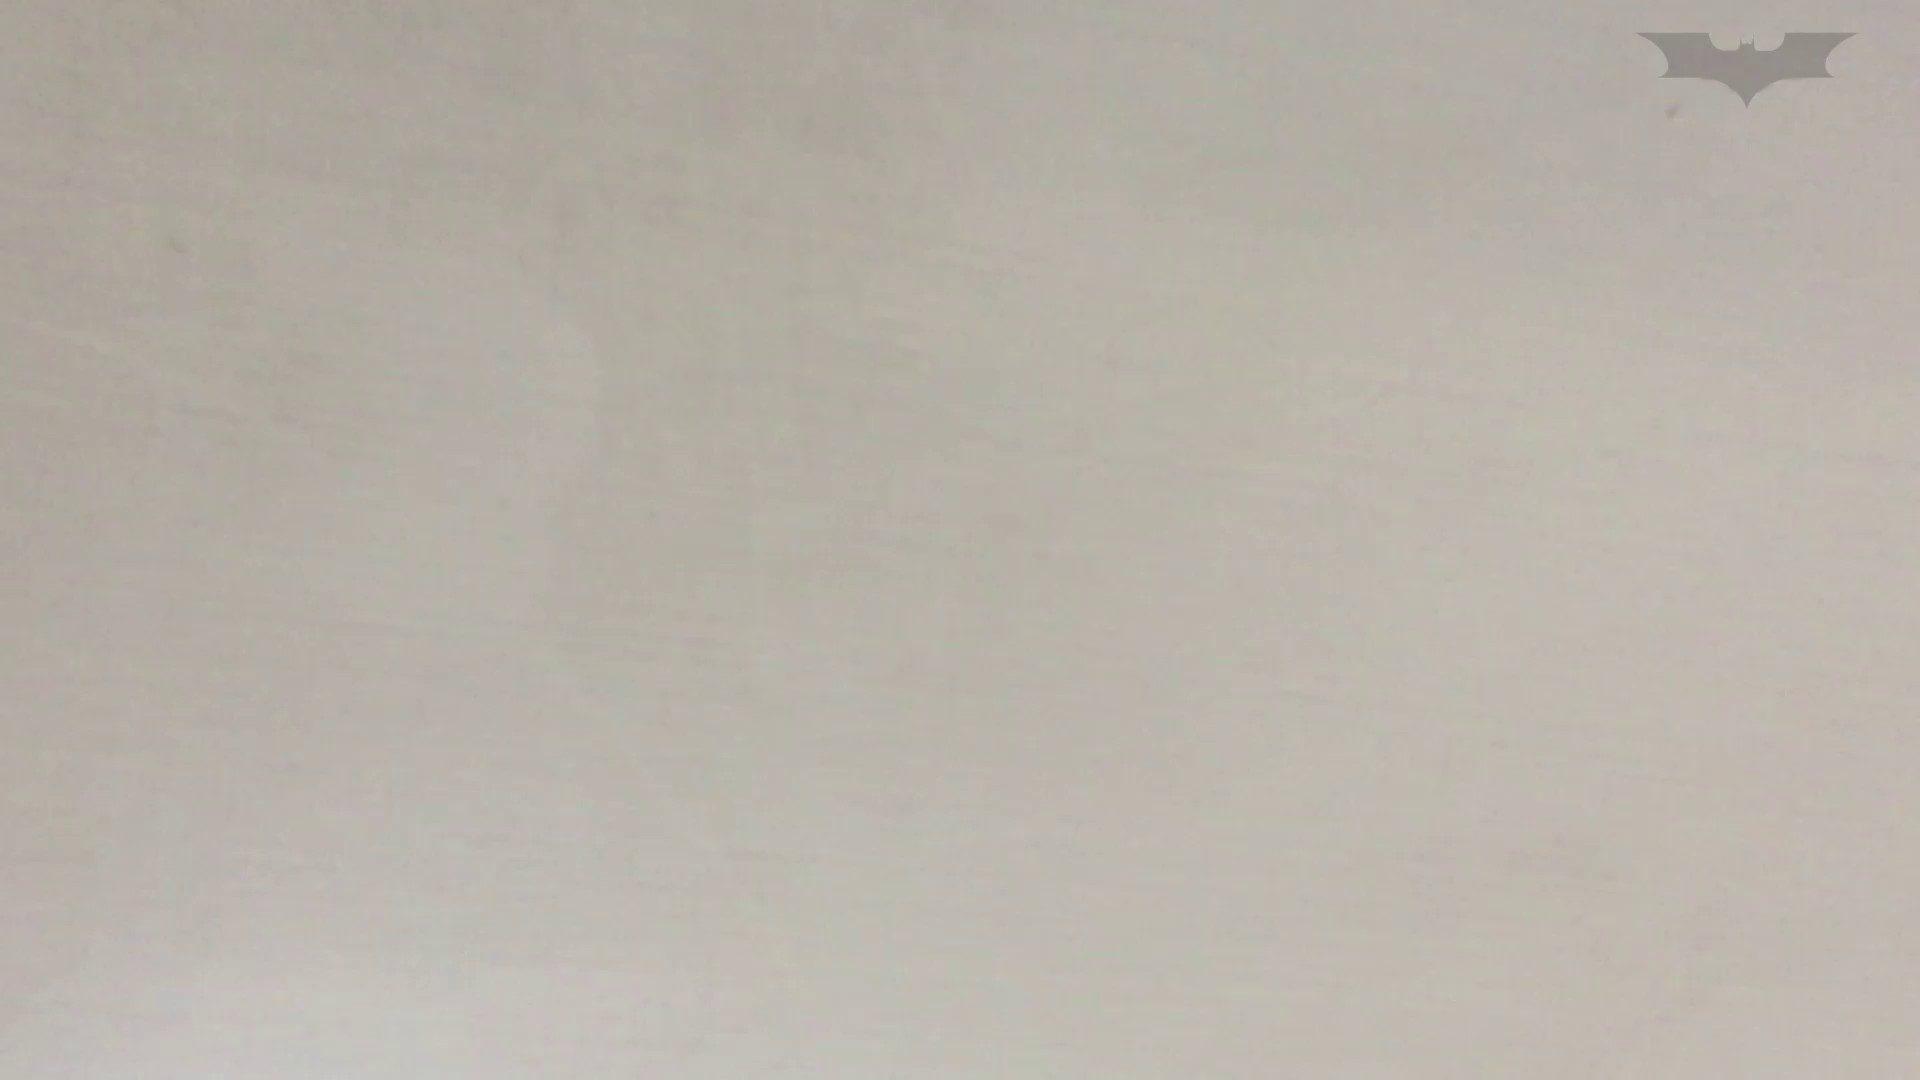 JD盗撮 美女の洗面所の秘密 Vol.74 OLの実態 盗撮ワレメ無修正動画無料 91pic 22